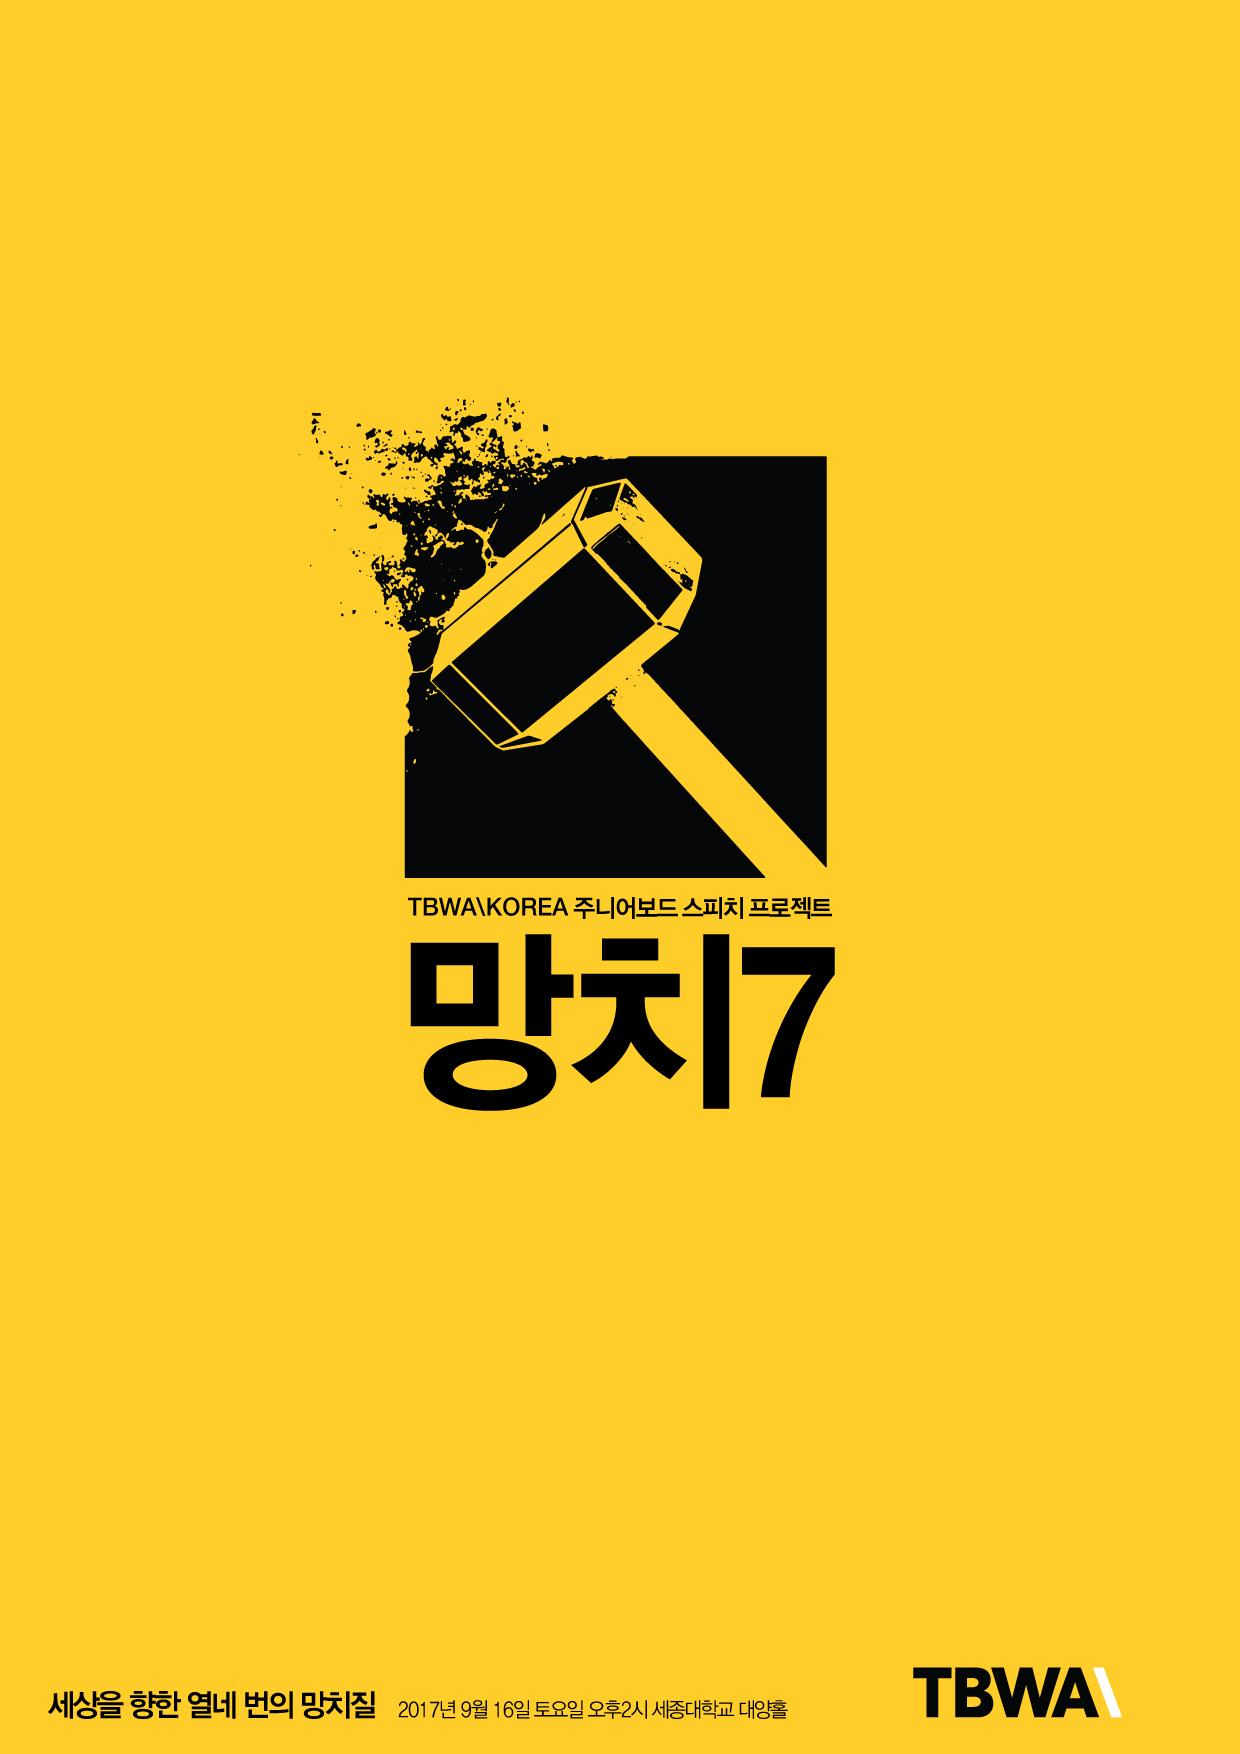 TBWA코리아 대학생 스피치 프로젝트 '망치7' 개최